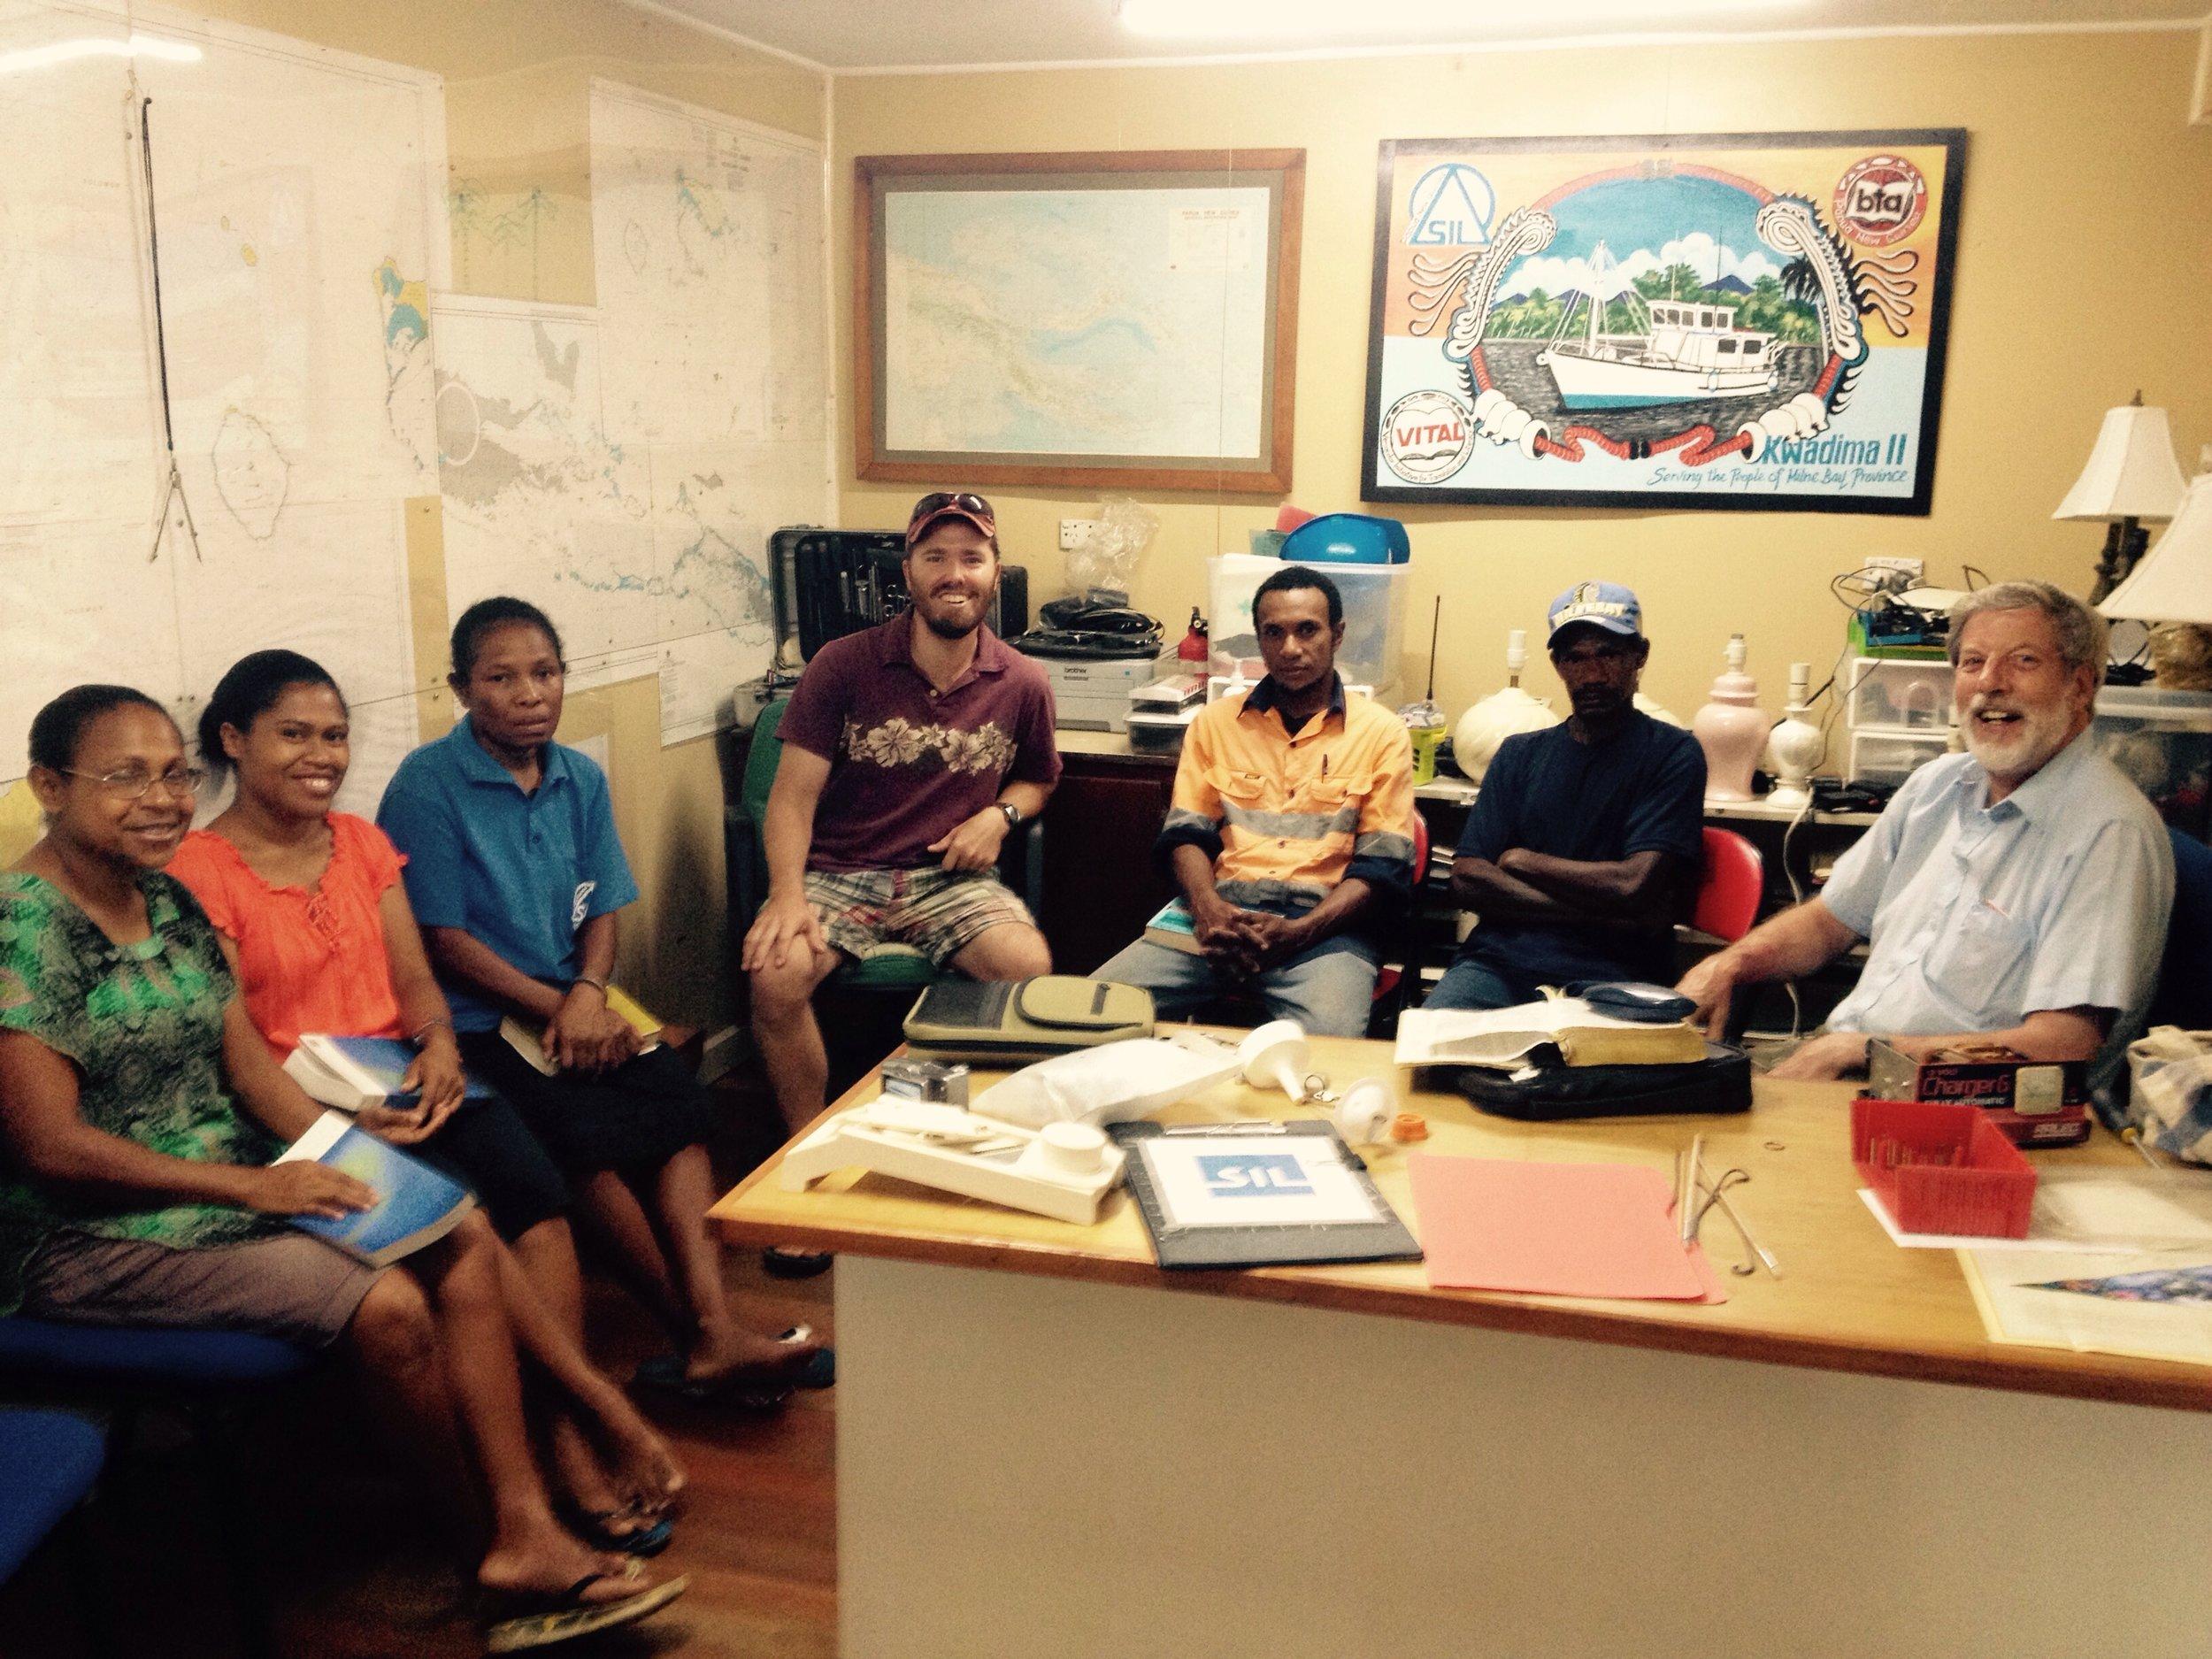 From left: Dora, Kelly, Susan, John, Mathew, Samson, and Joe in the Alotau Regional Center office.